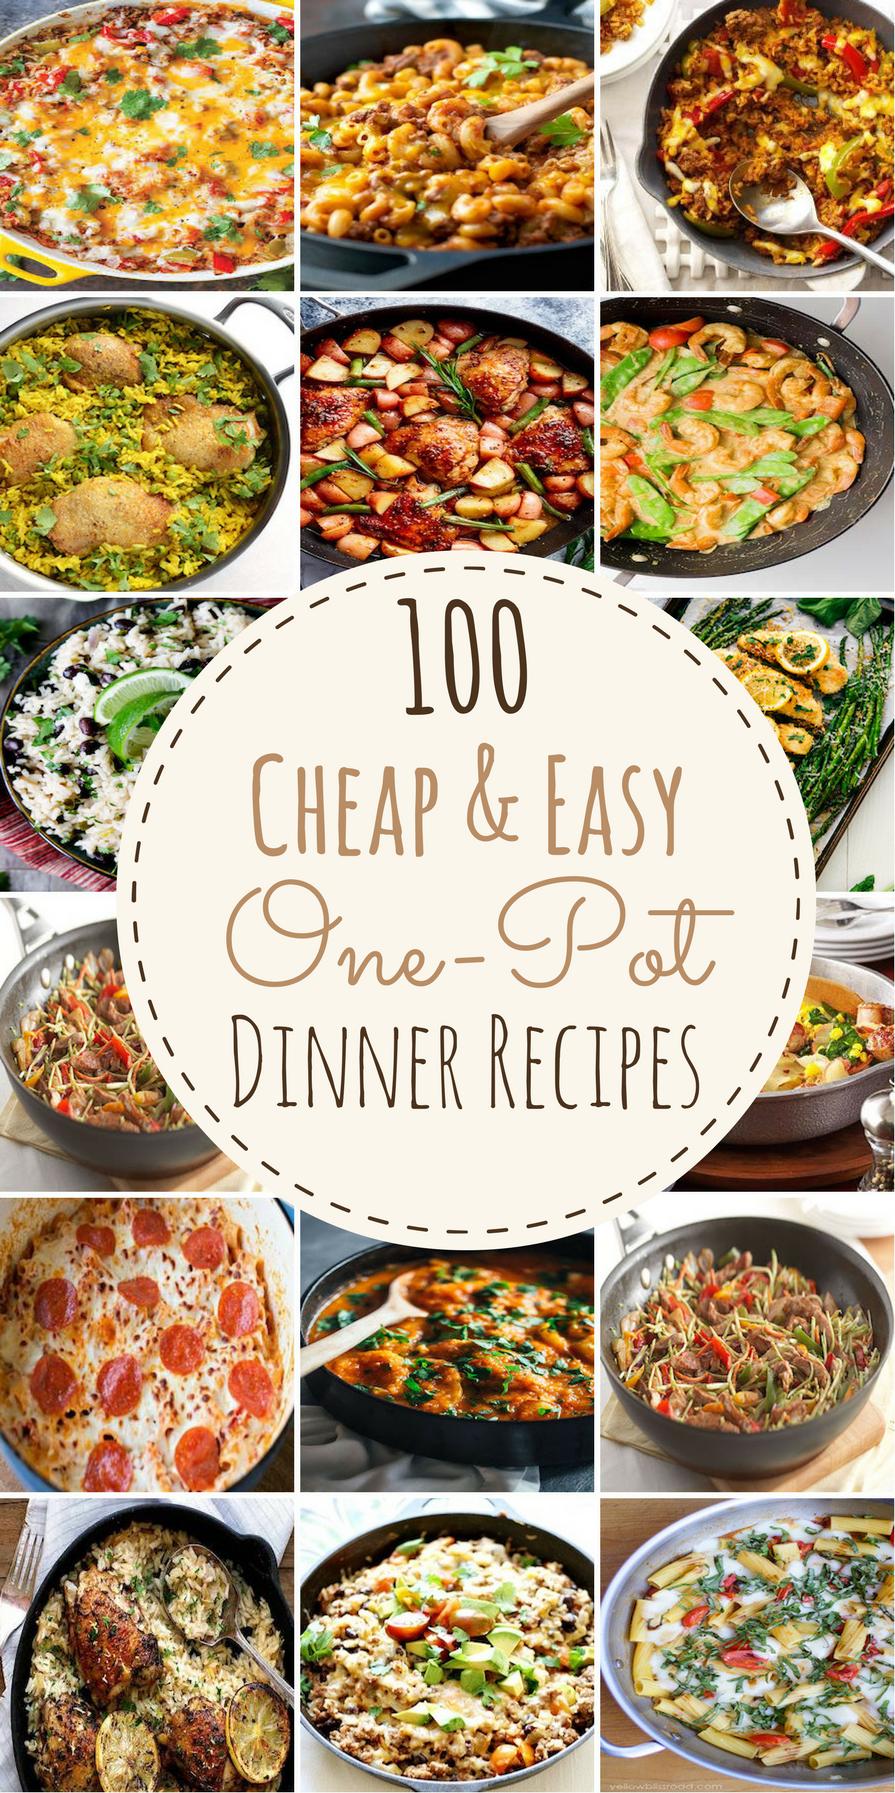 healthy slow cooker recipes100 healthy crock pot recipes for quick easy one pot meals